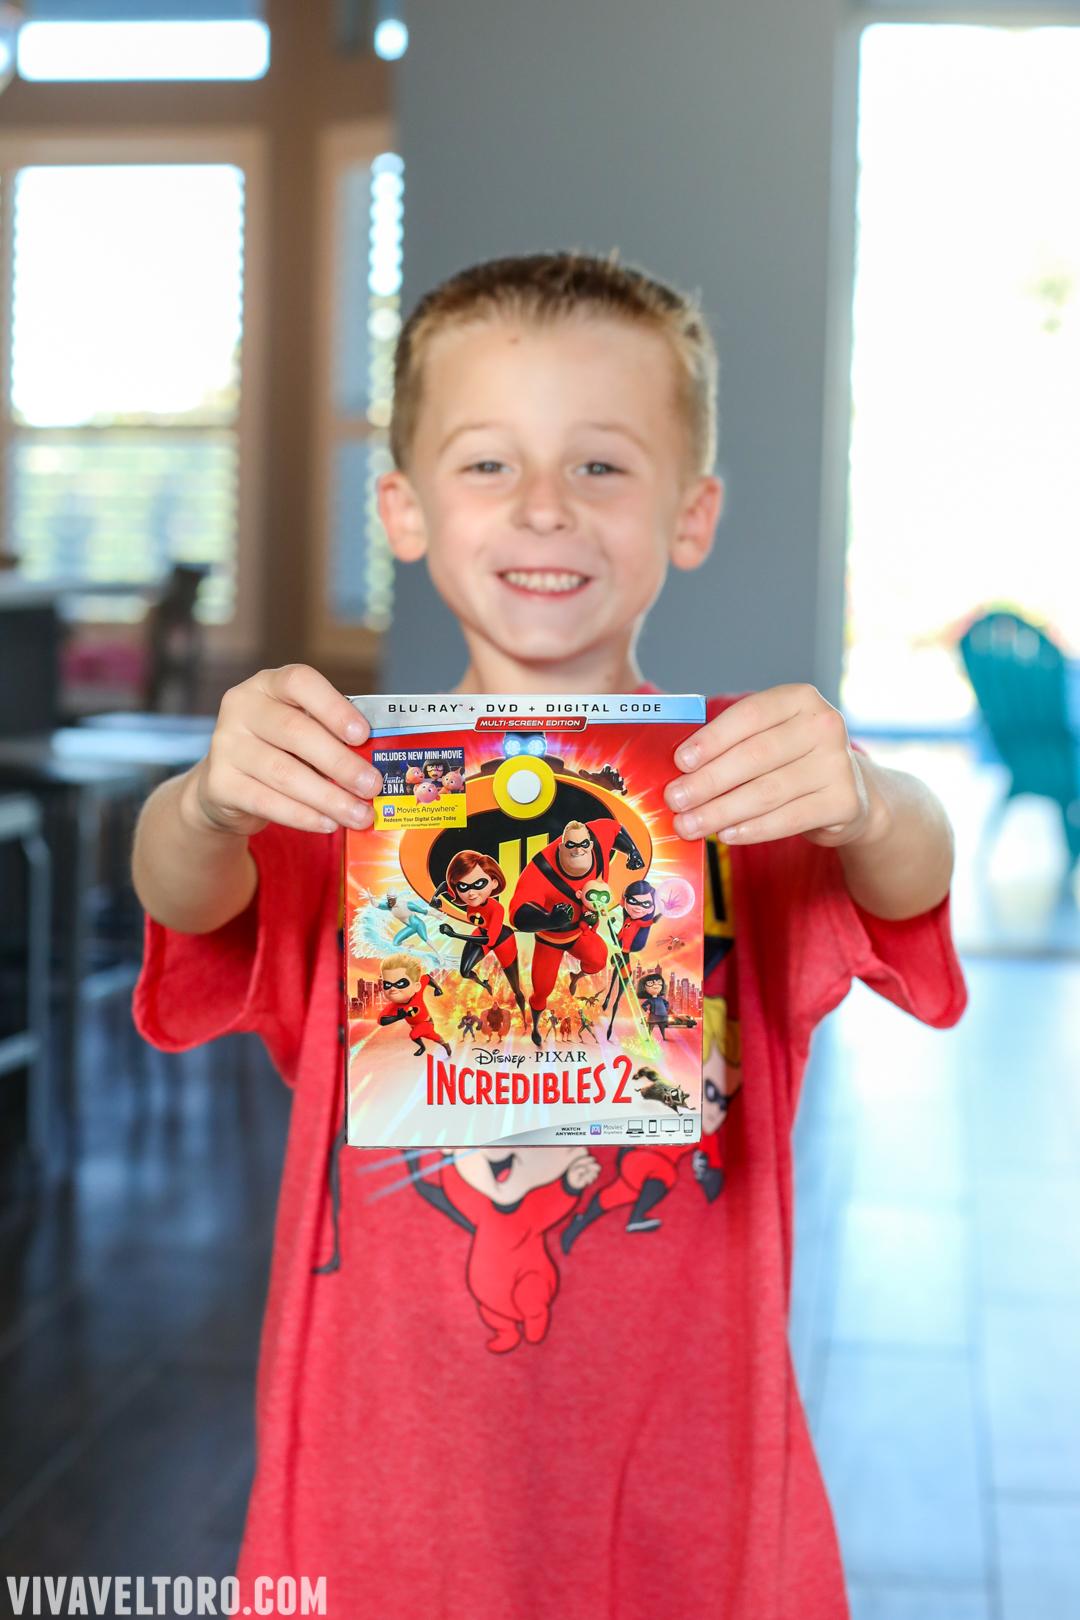 e1645f25f Incredibles 2 Bursts Onto Blu-ray November 6th! Check Out The Bonus  Content! - Viva Veltoro